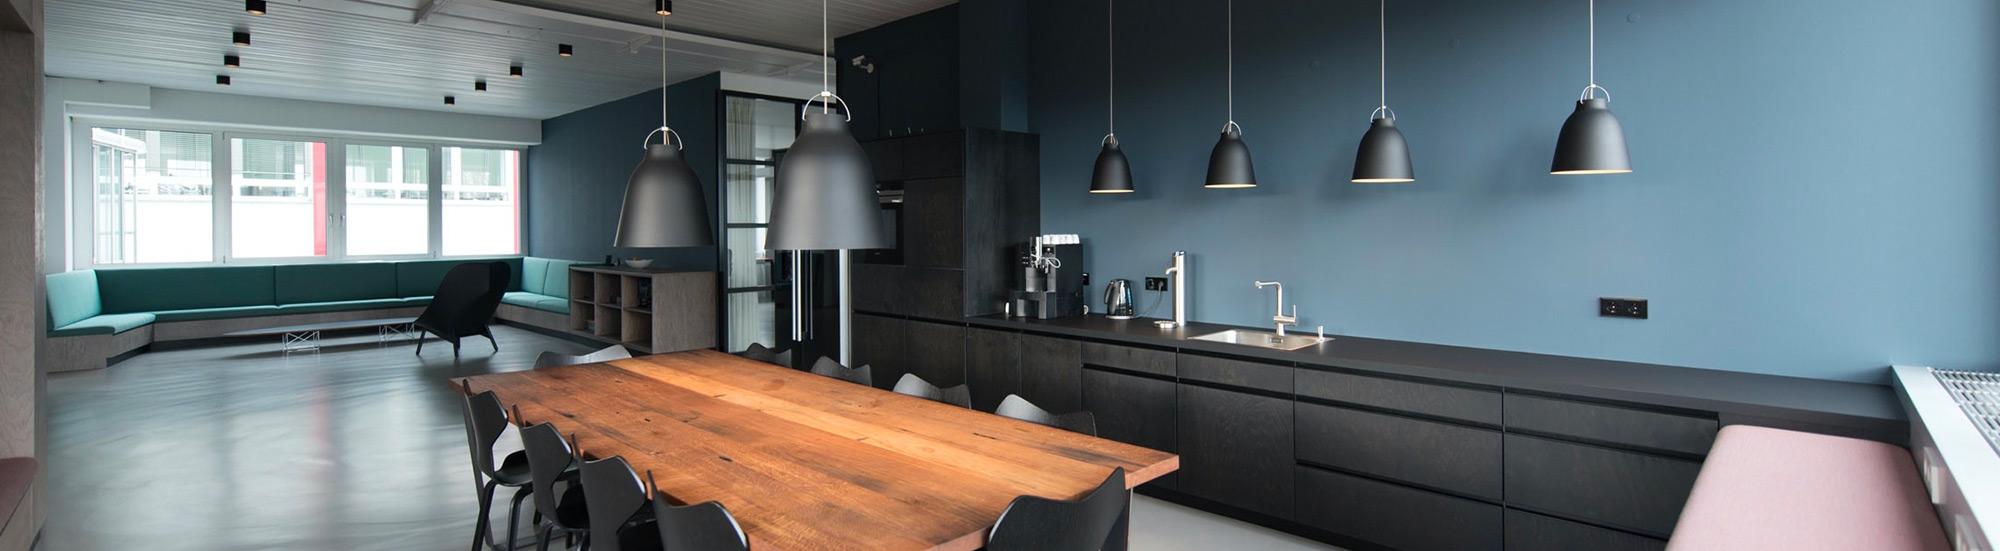 6. Interior design in Italy